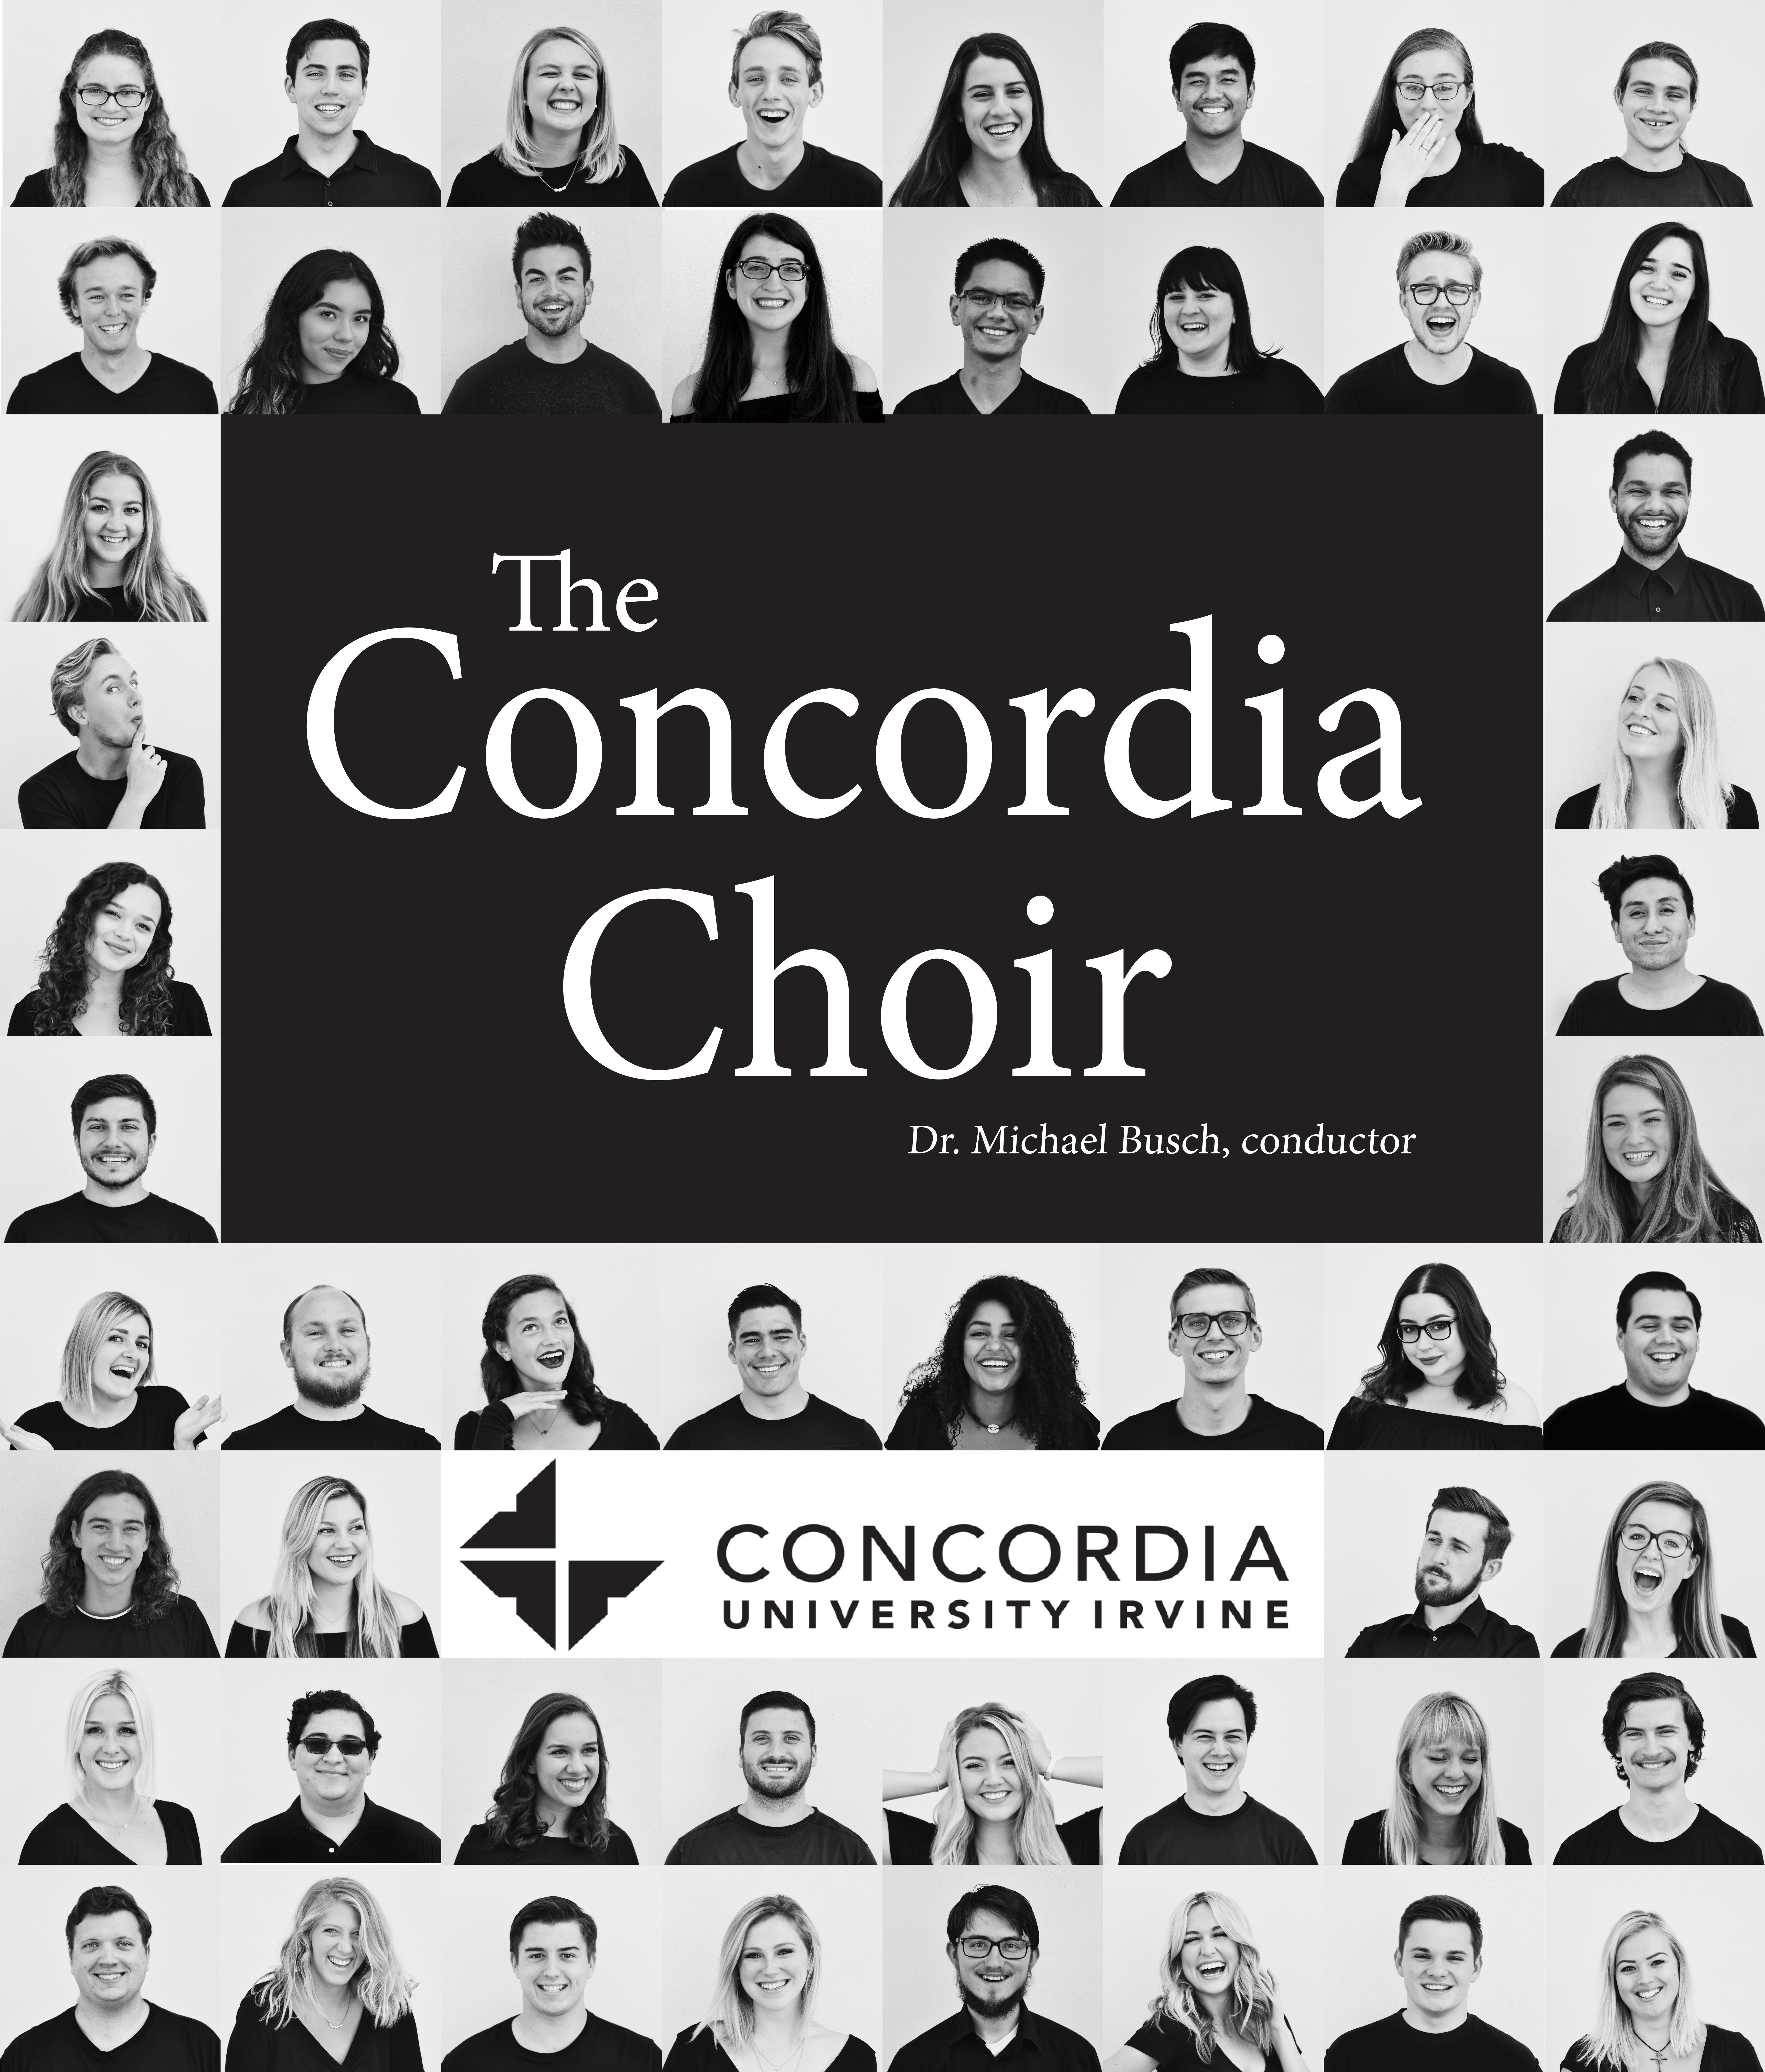 Concordia Choir | Concordia University Irvine